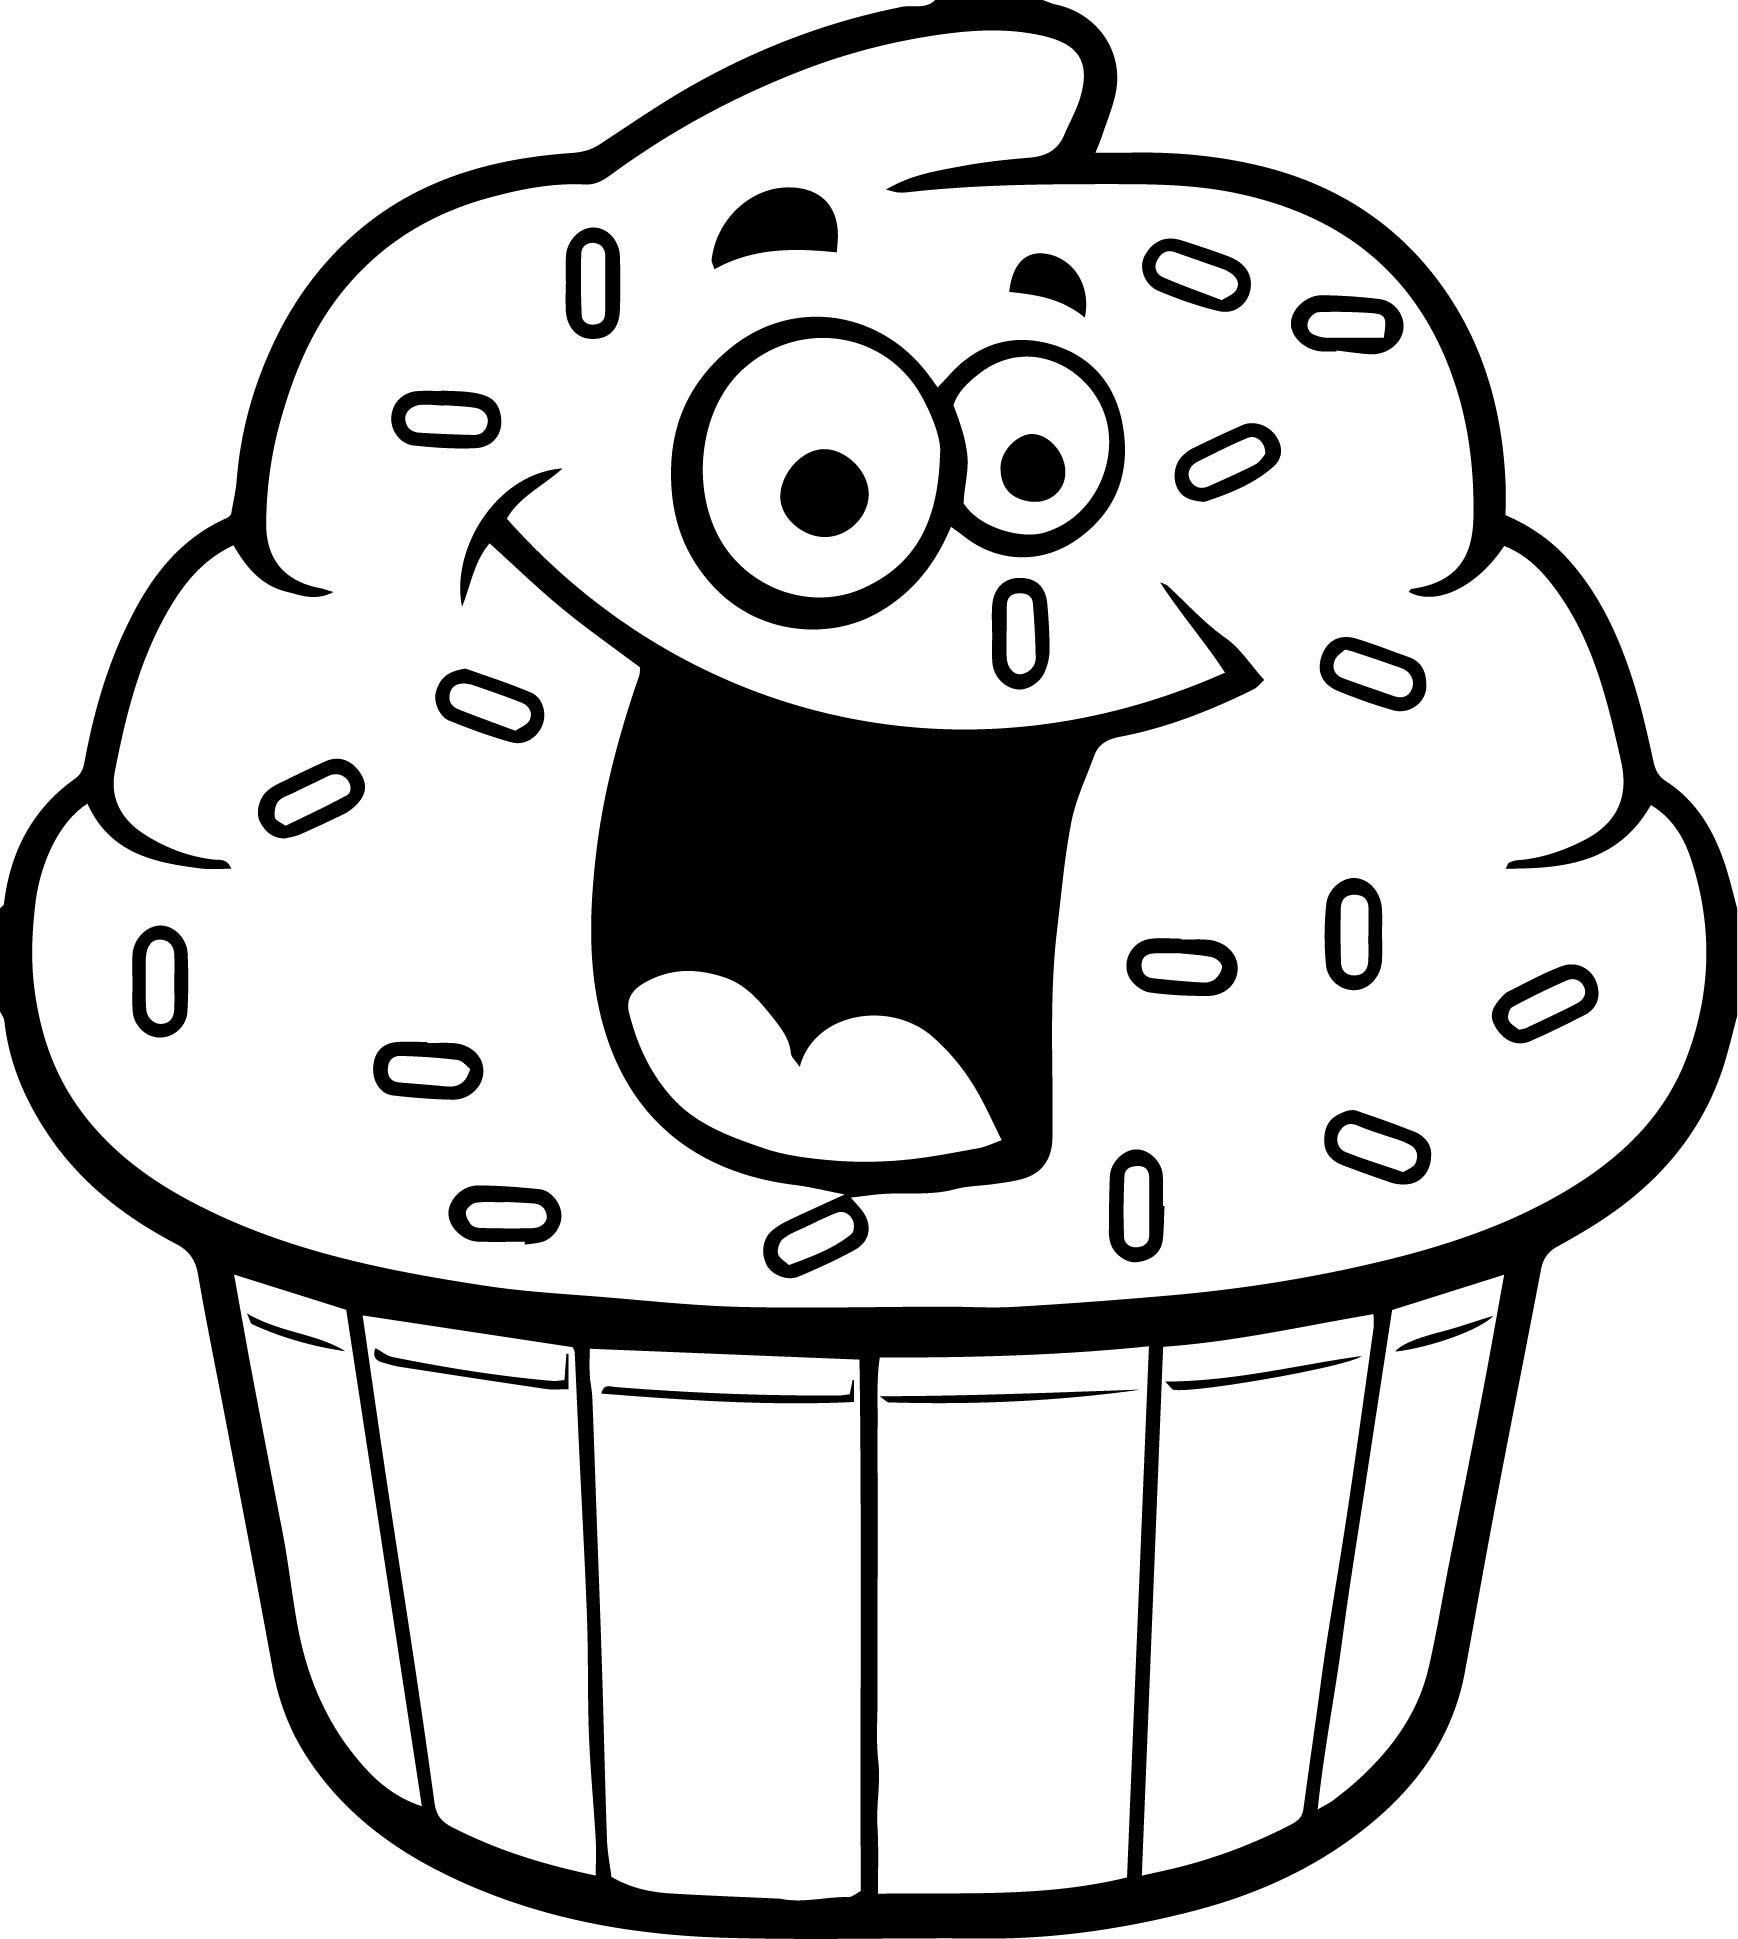 Cartoon Cupcake Coloring Page